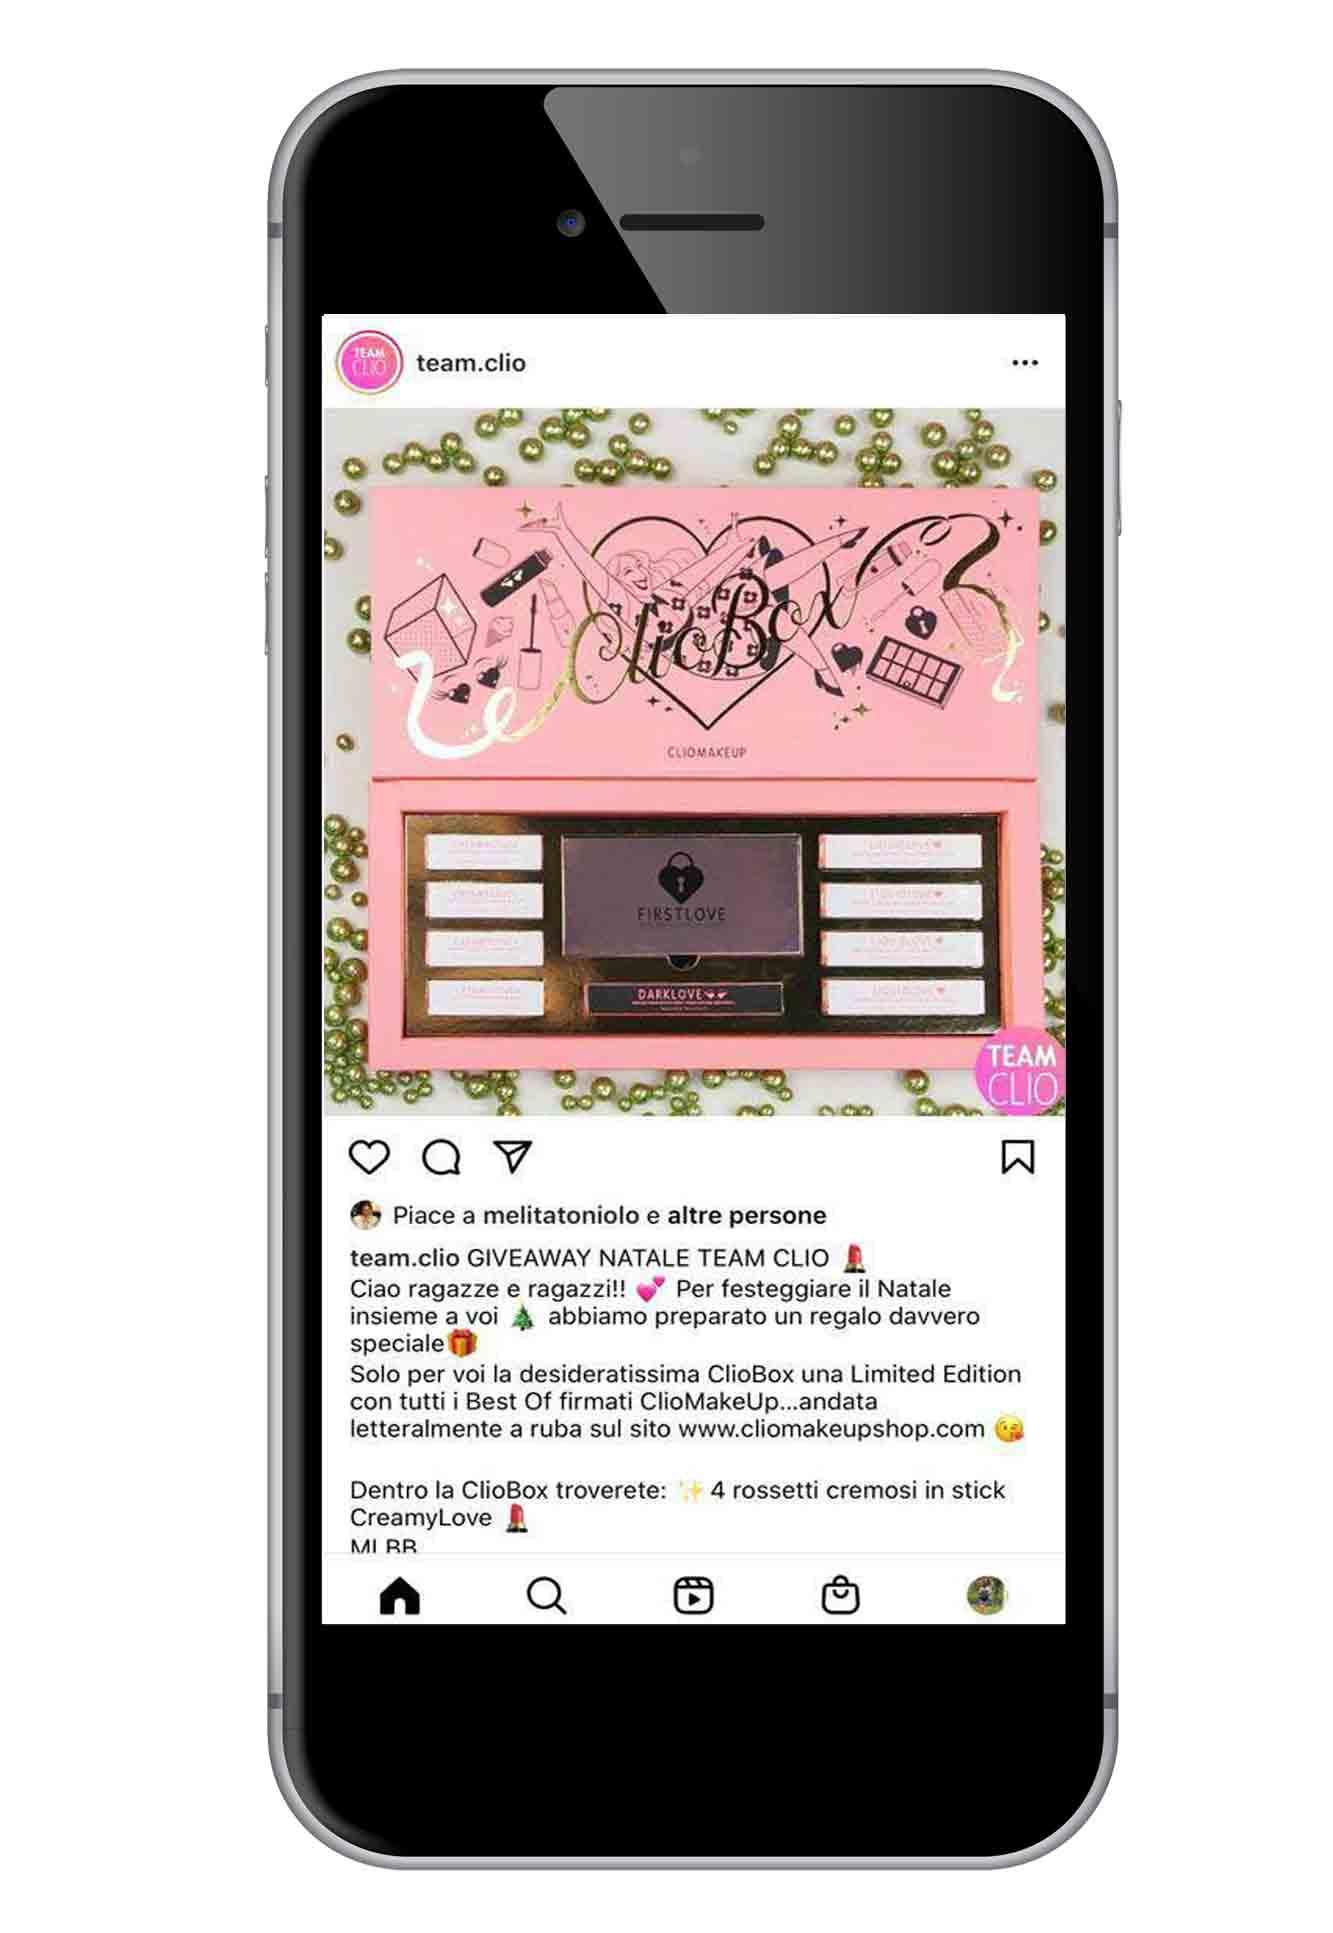 Giveawaydi Clio Make Up su Instagram